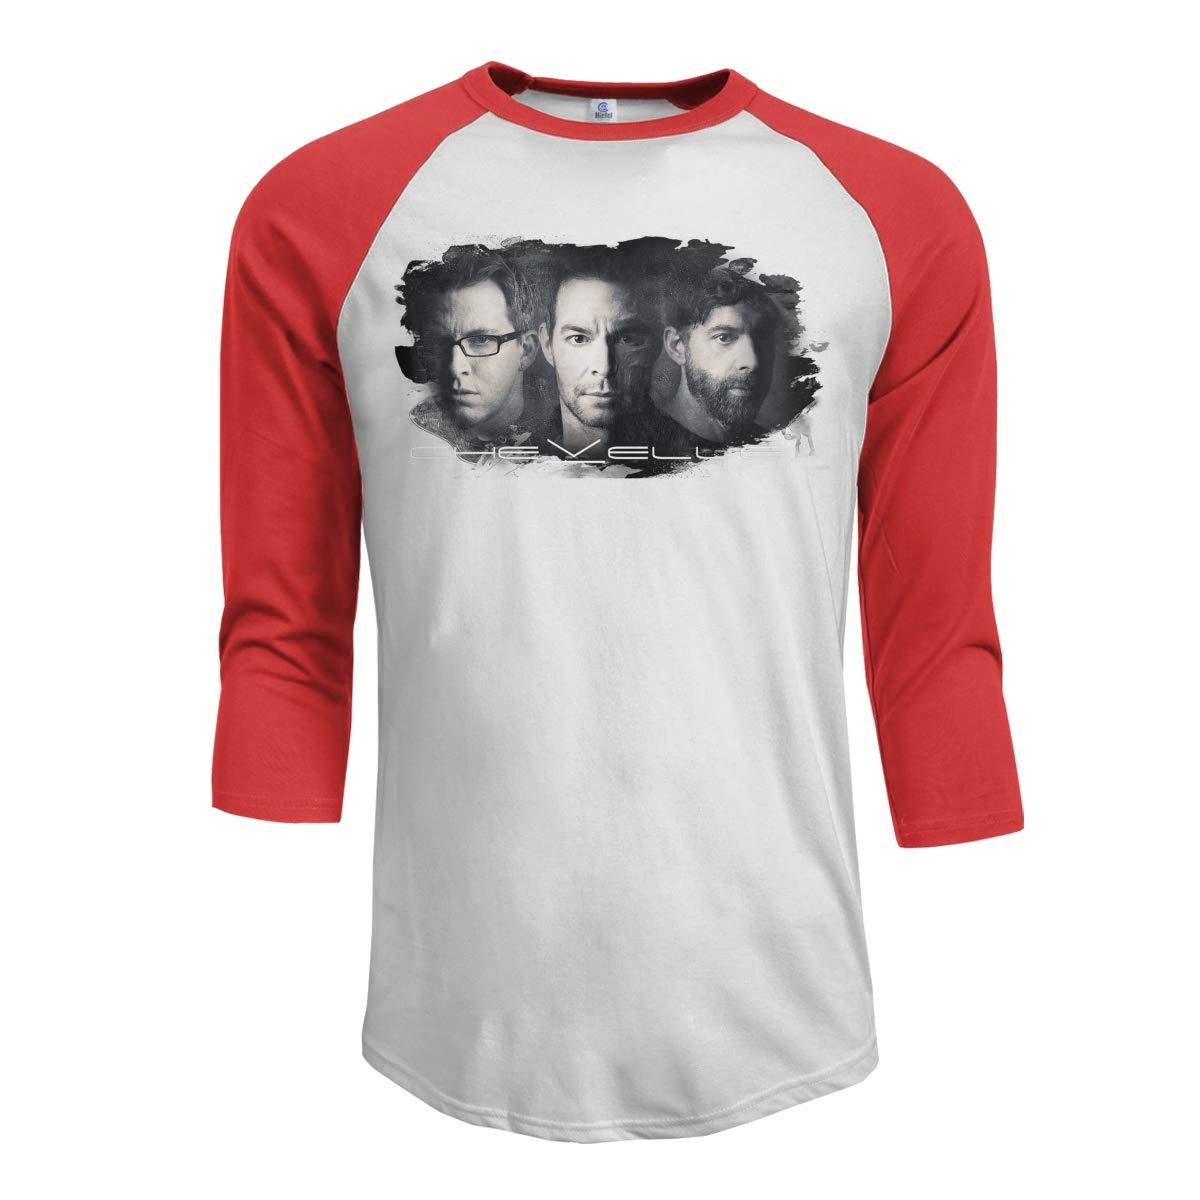 Chevelle para hombre elegante 3/4-manga raglán camiseta unisex hombres mujeres camiseta